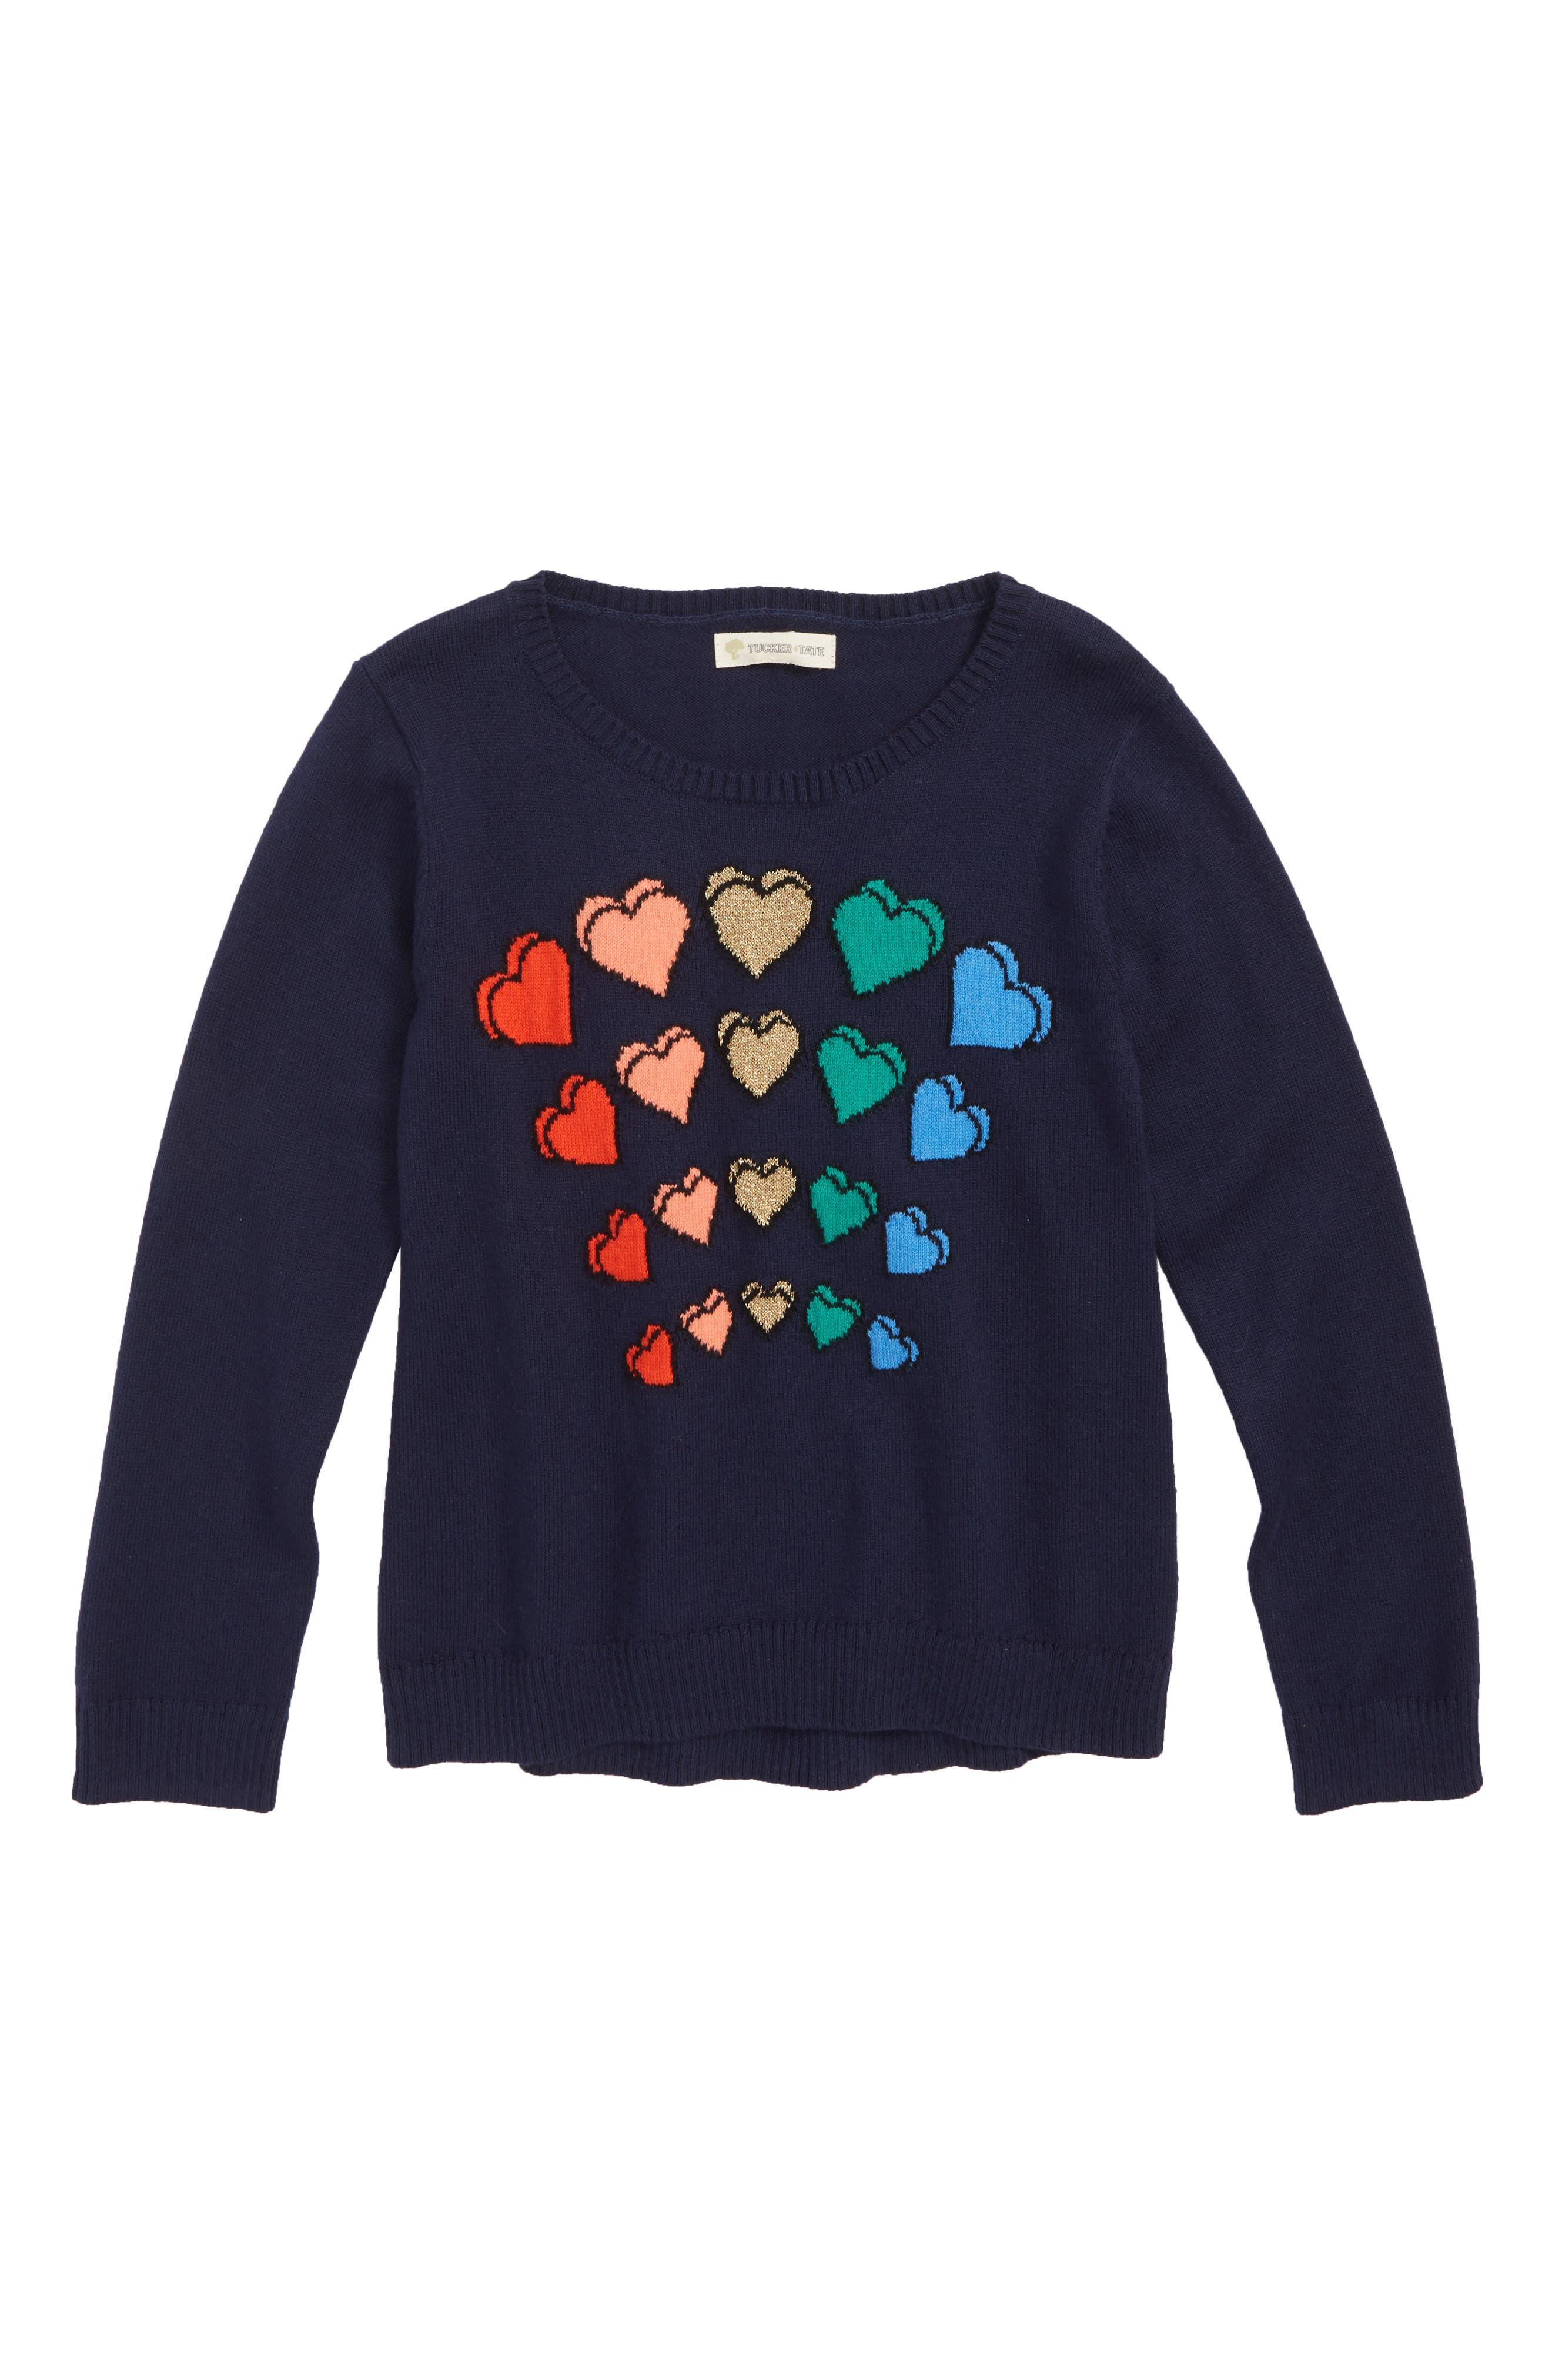 TUCKER + TATE Sparkle Heart Sweater, Main, color, 410